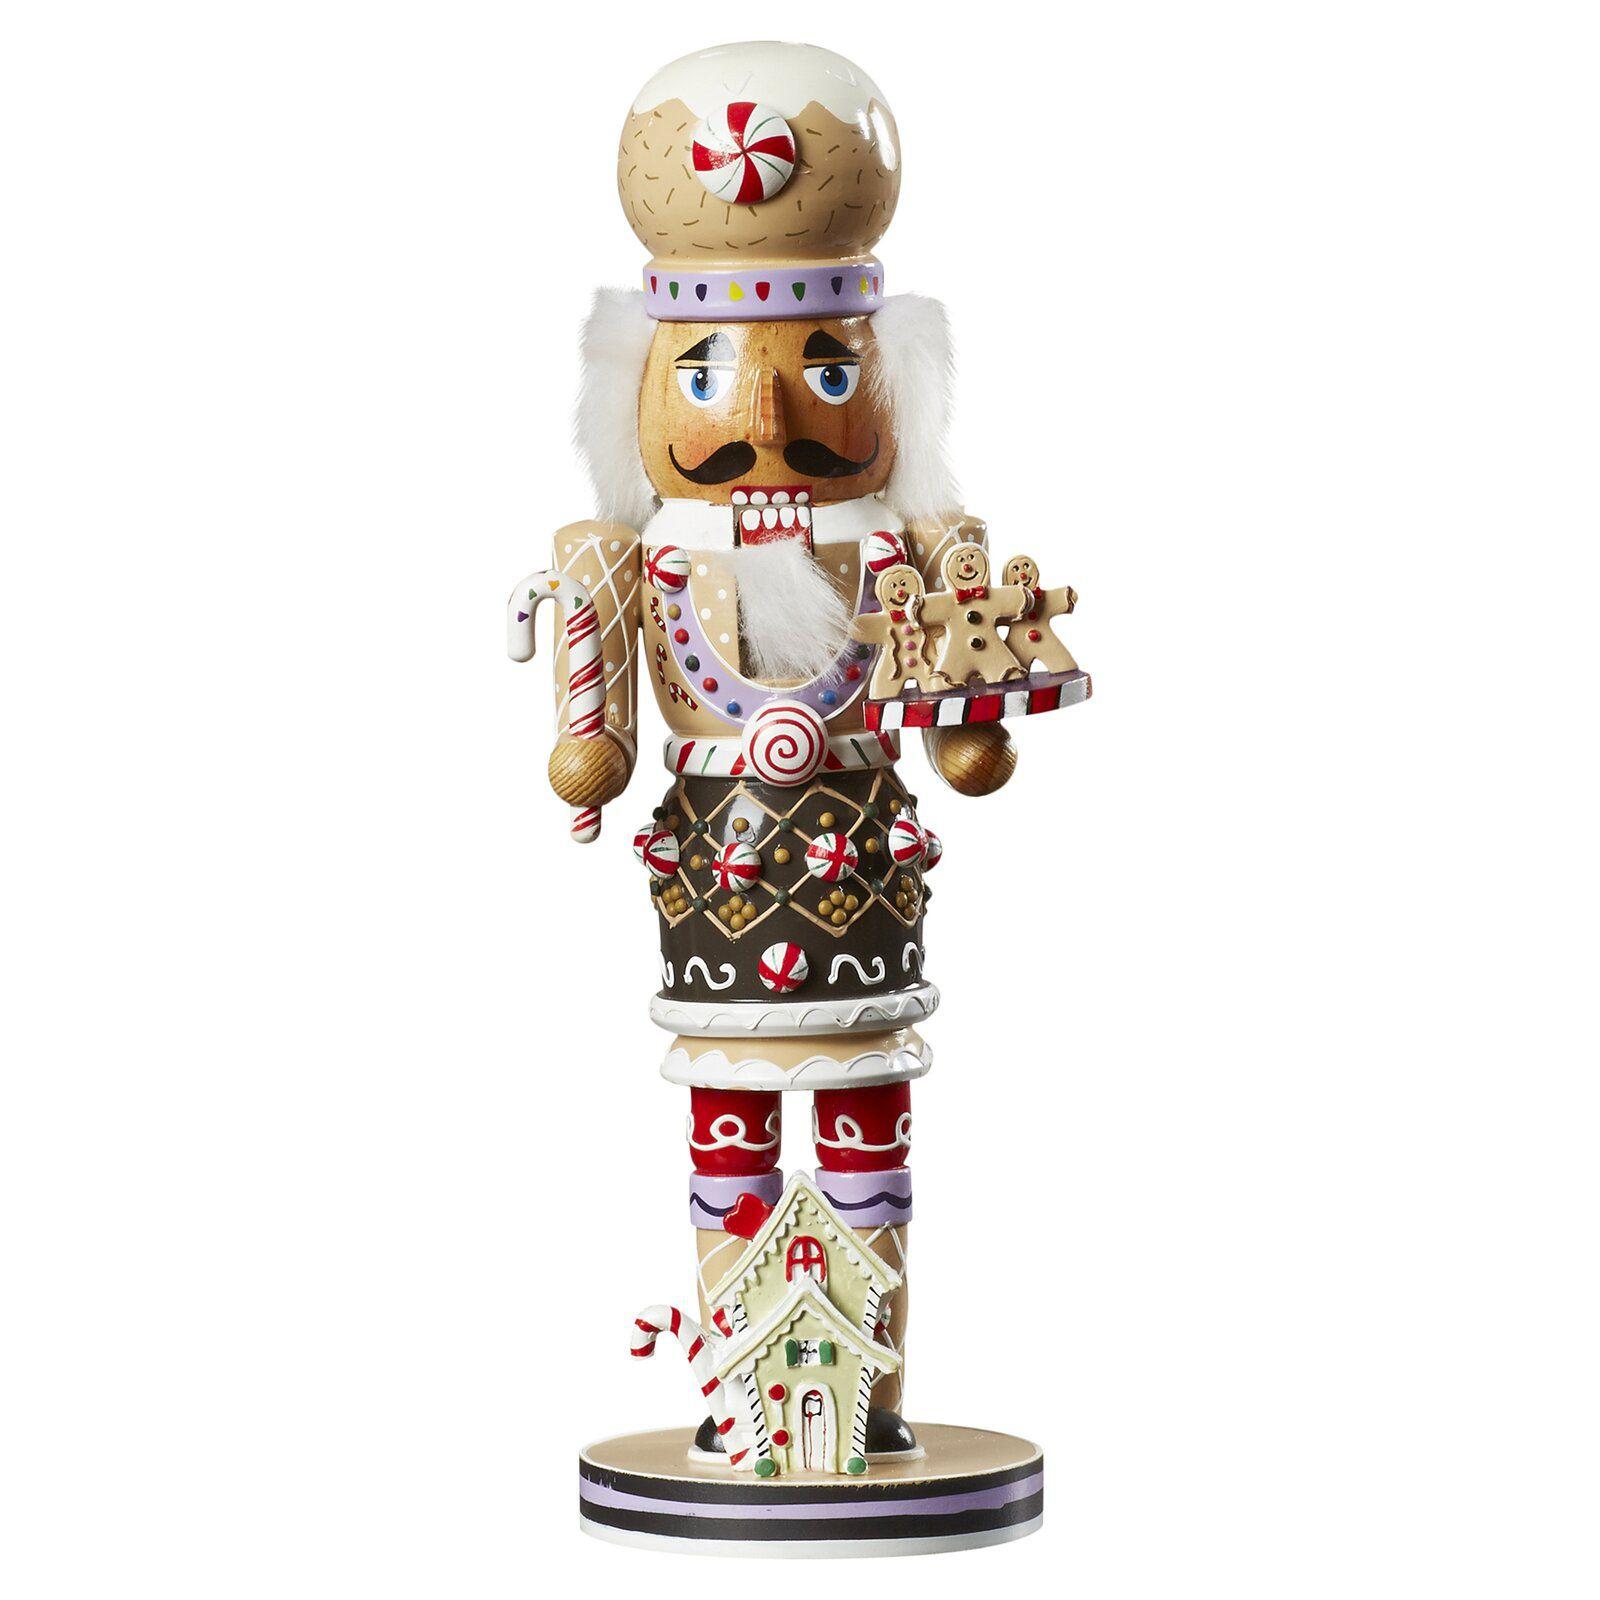 Kurt S. Adler 16-Inch Wooden Gingerbread Christmas Nutcracker